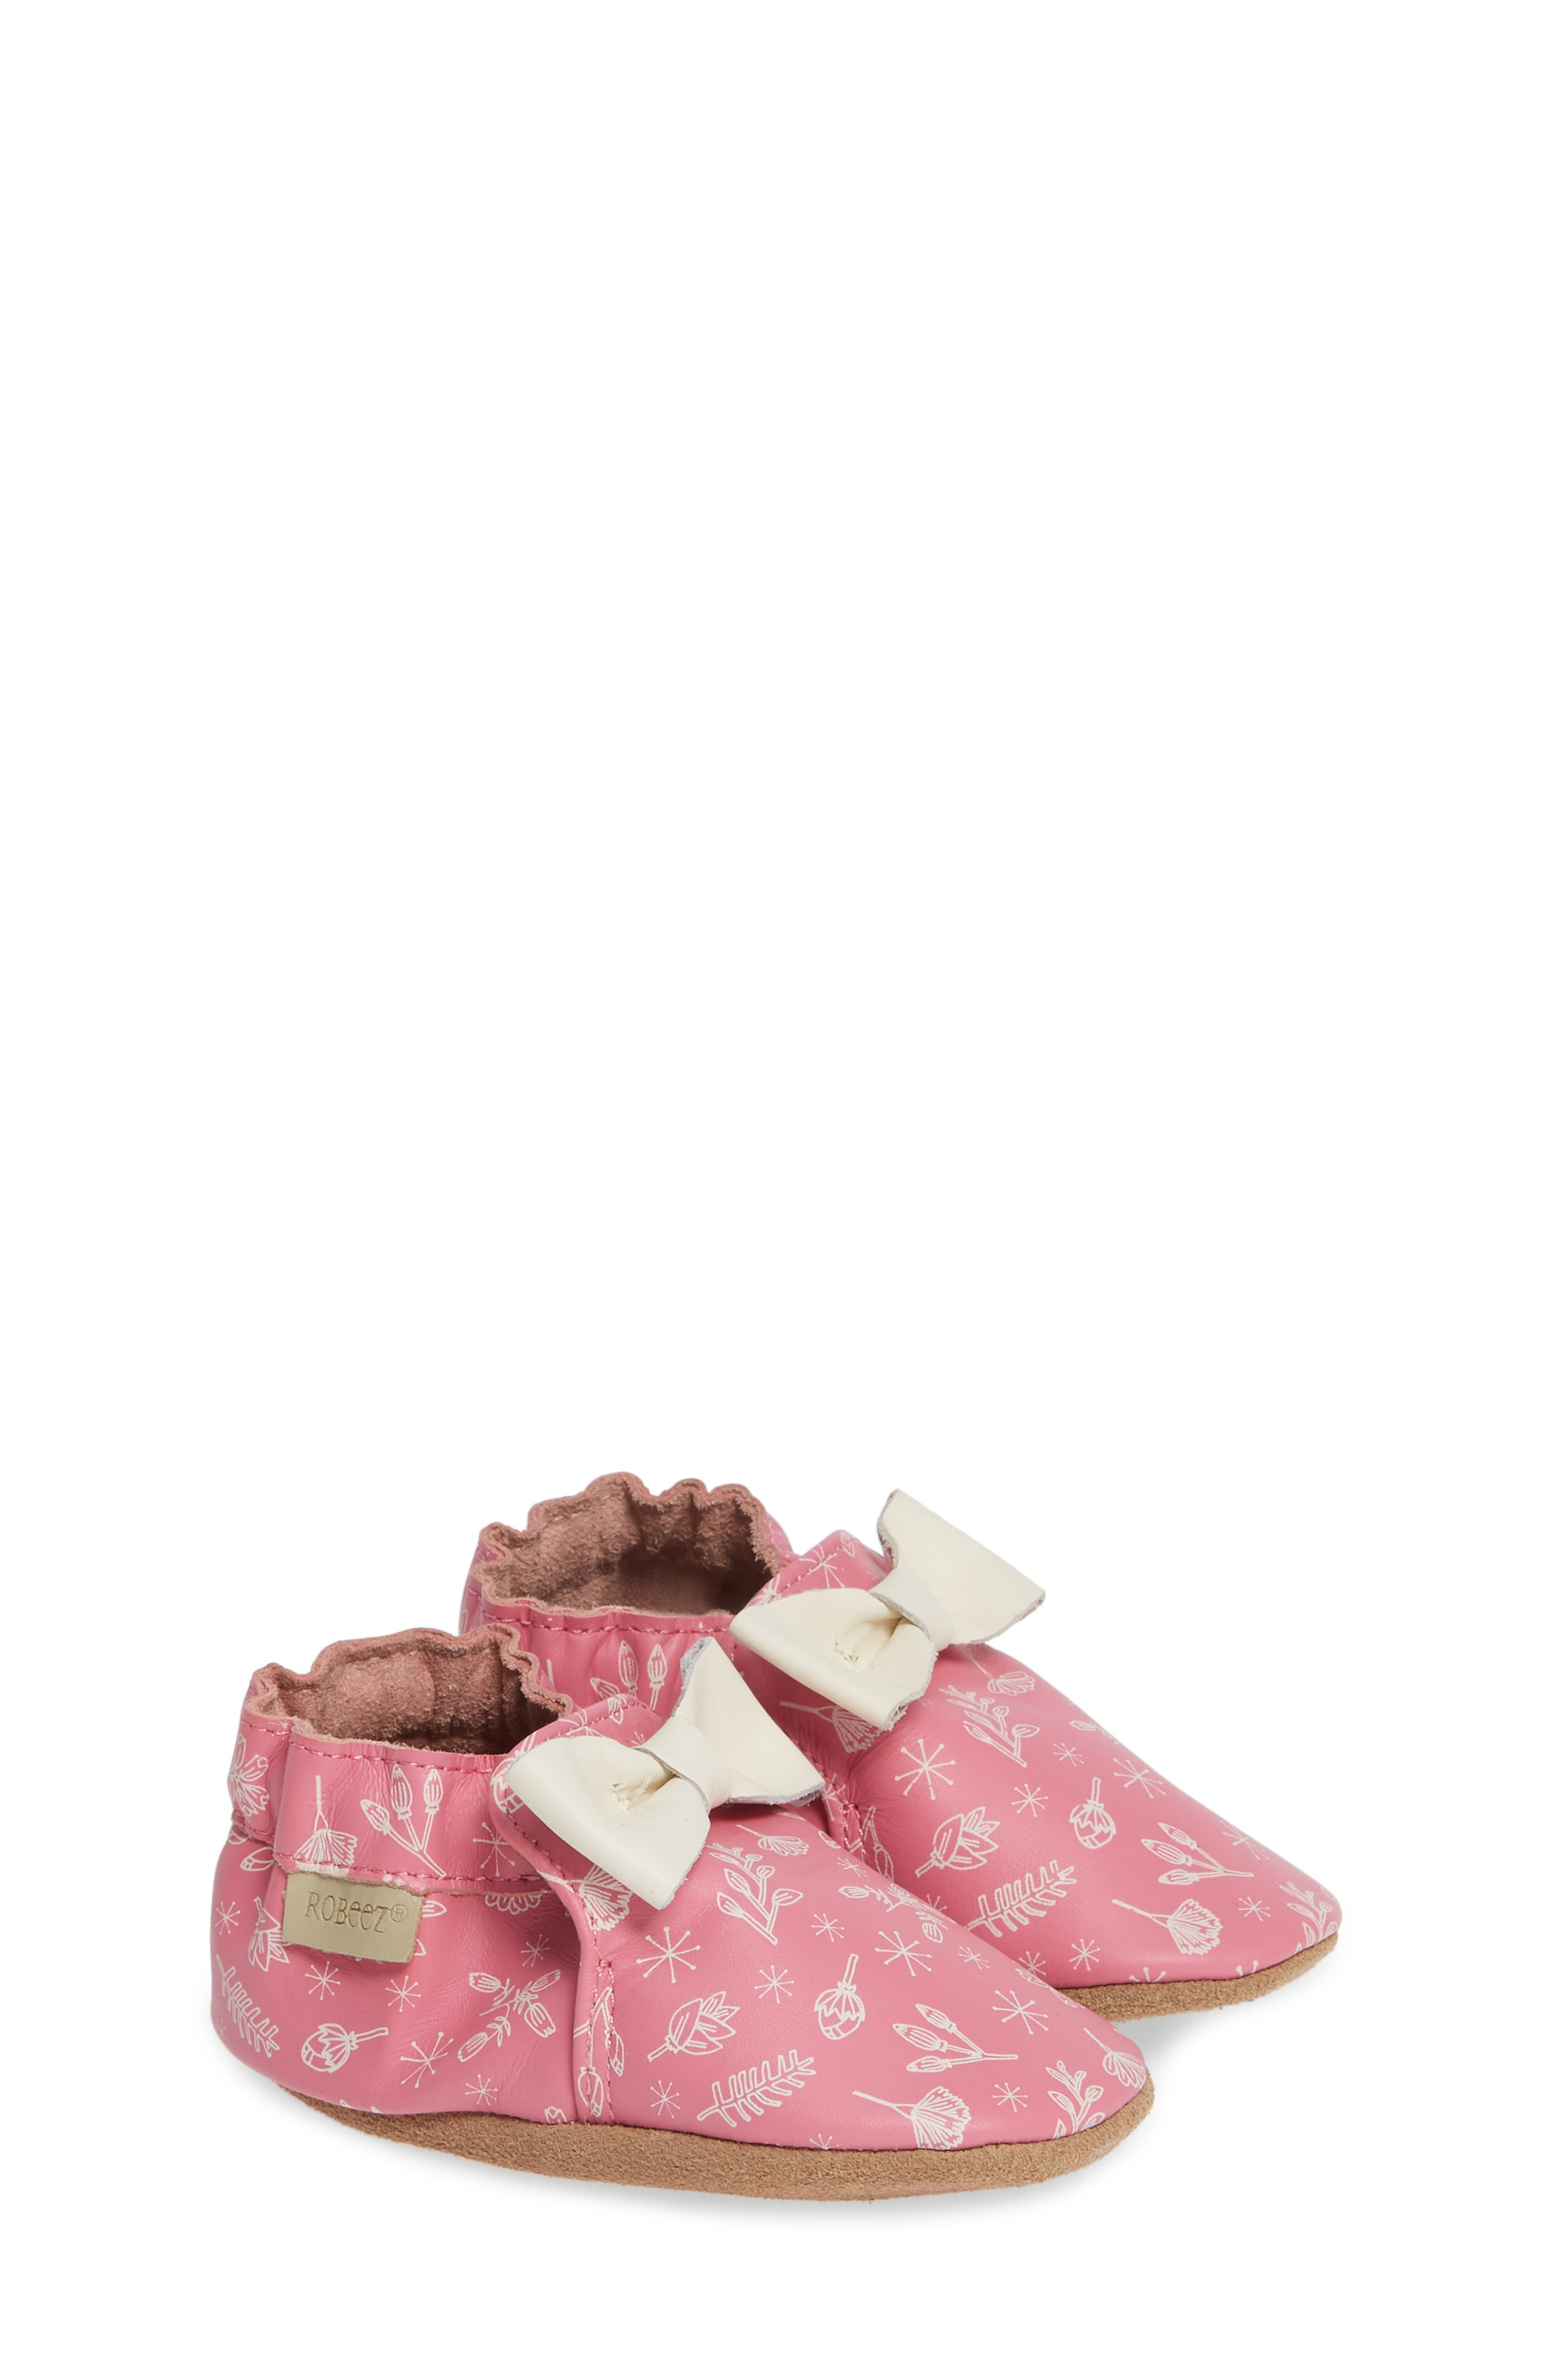 ROBEEZ<SUP>®</SUP>, Francesca Floral Crib Shoe, Alternate thumbnail 2, color, PINK